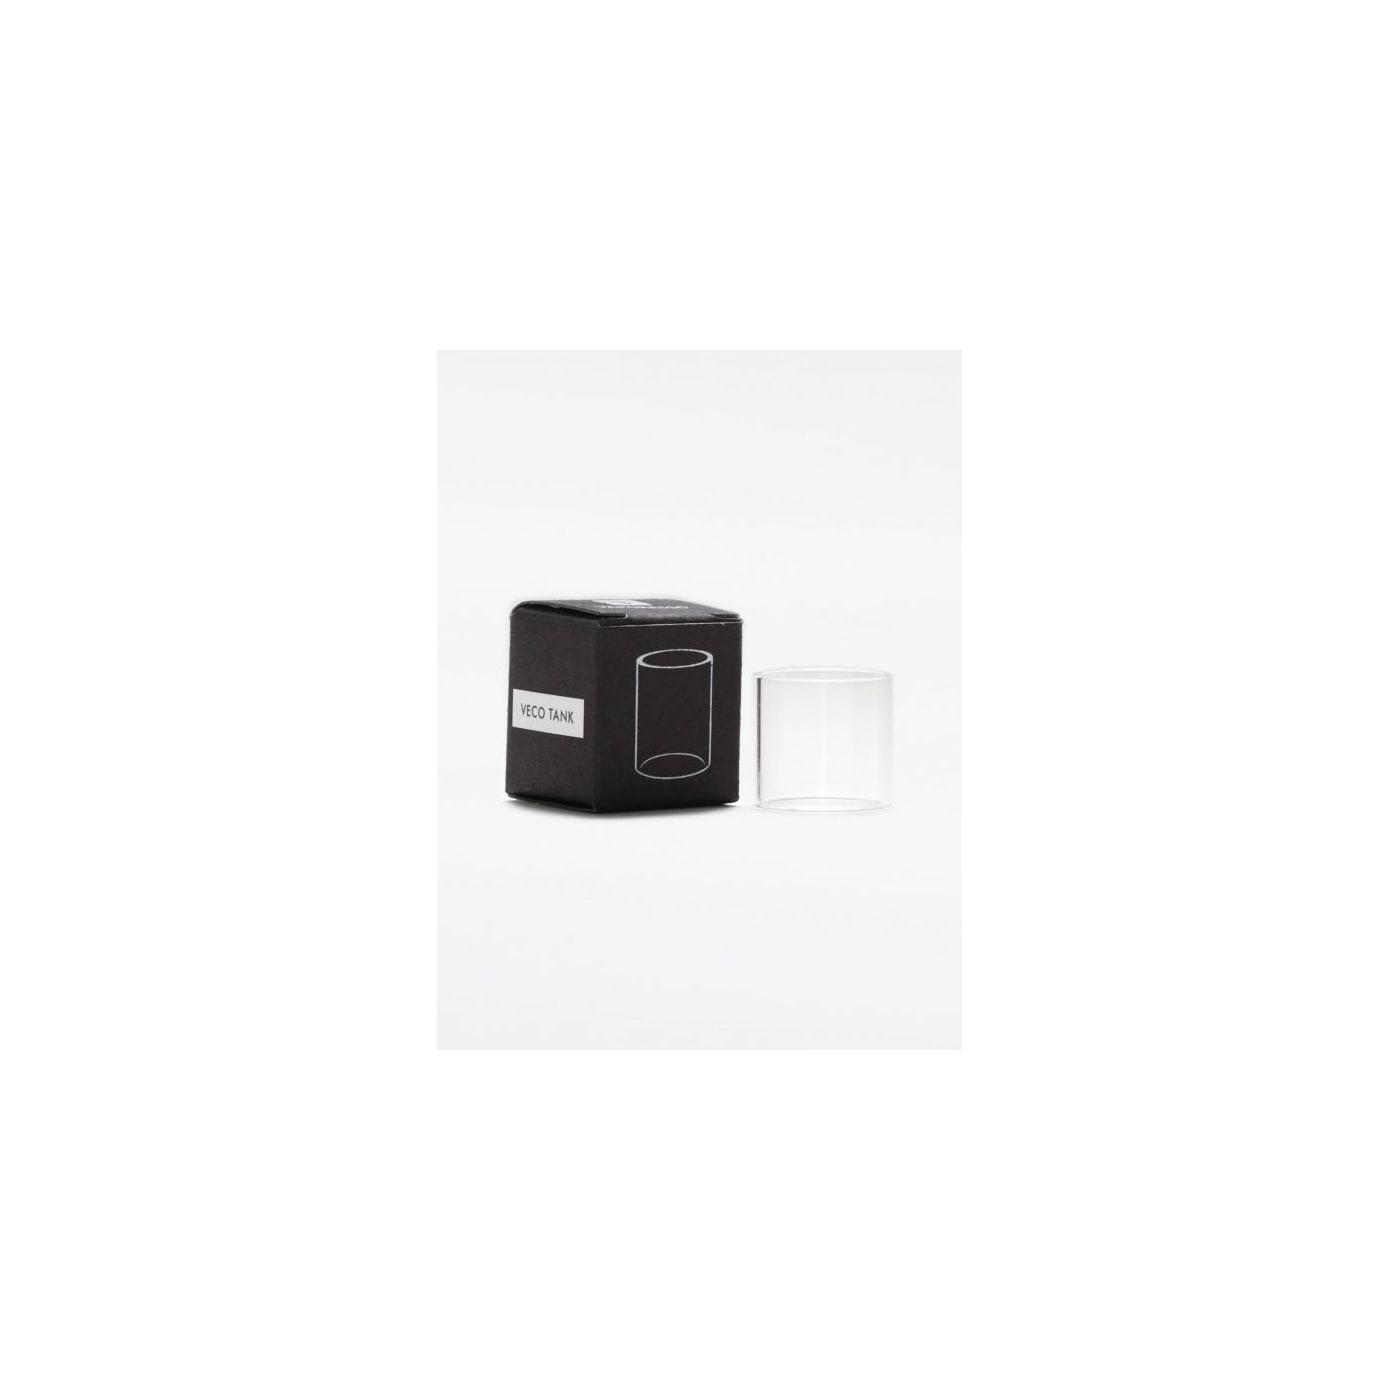 Vaporesso Tarot Nano Replacement Glass - 1 Pack